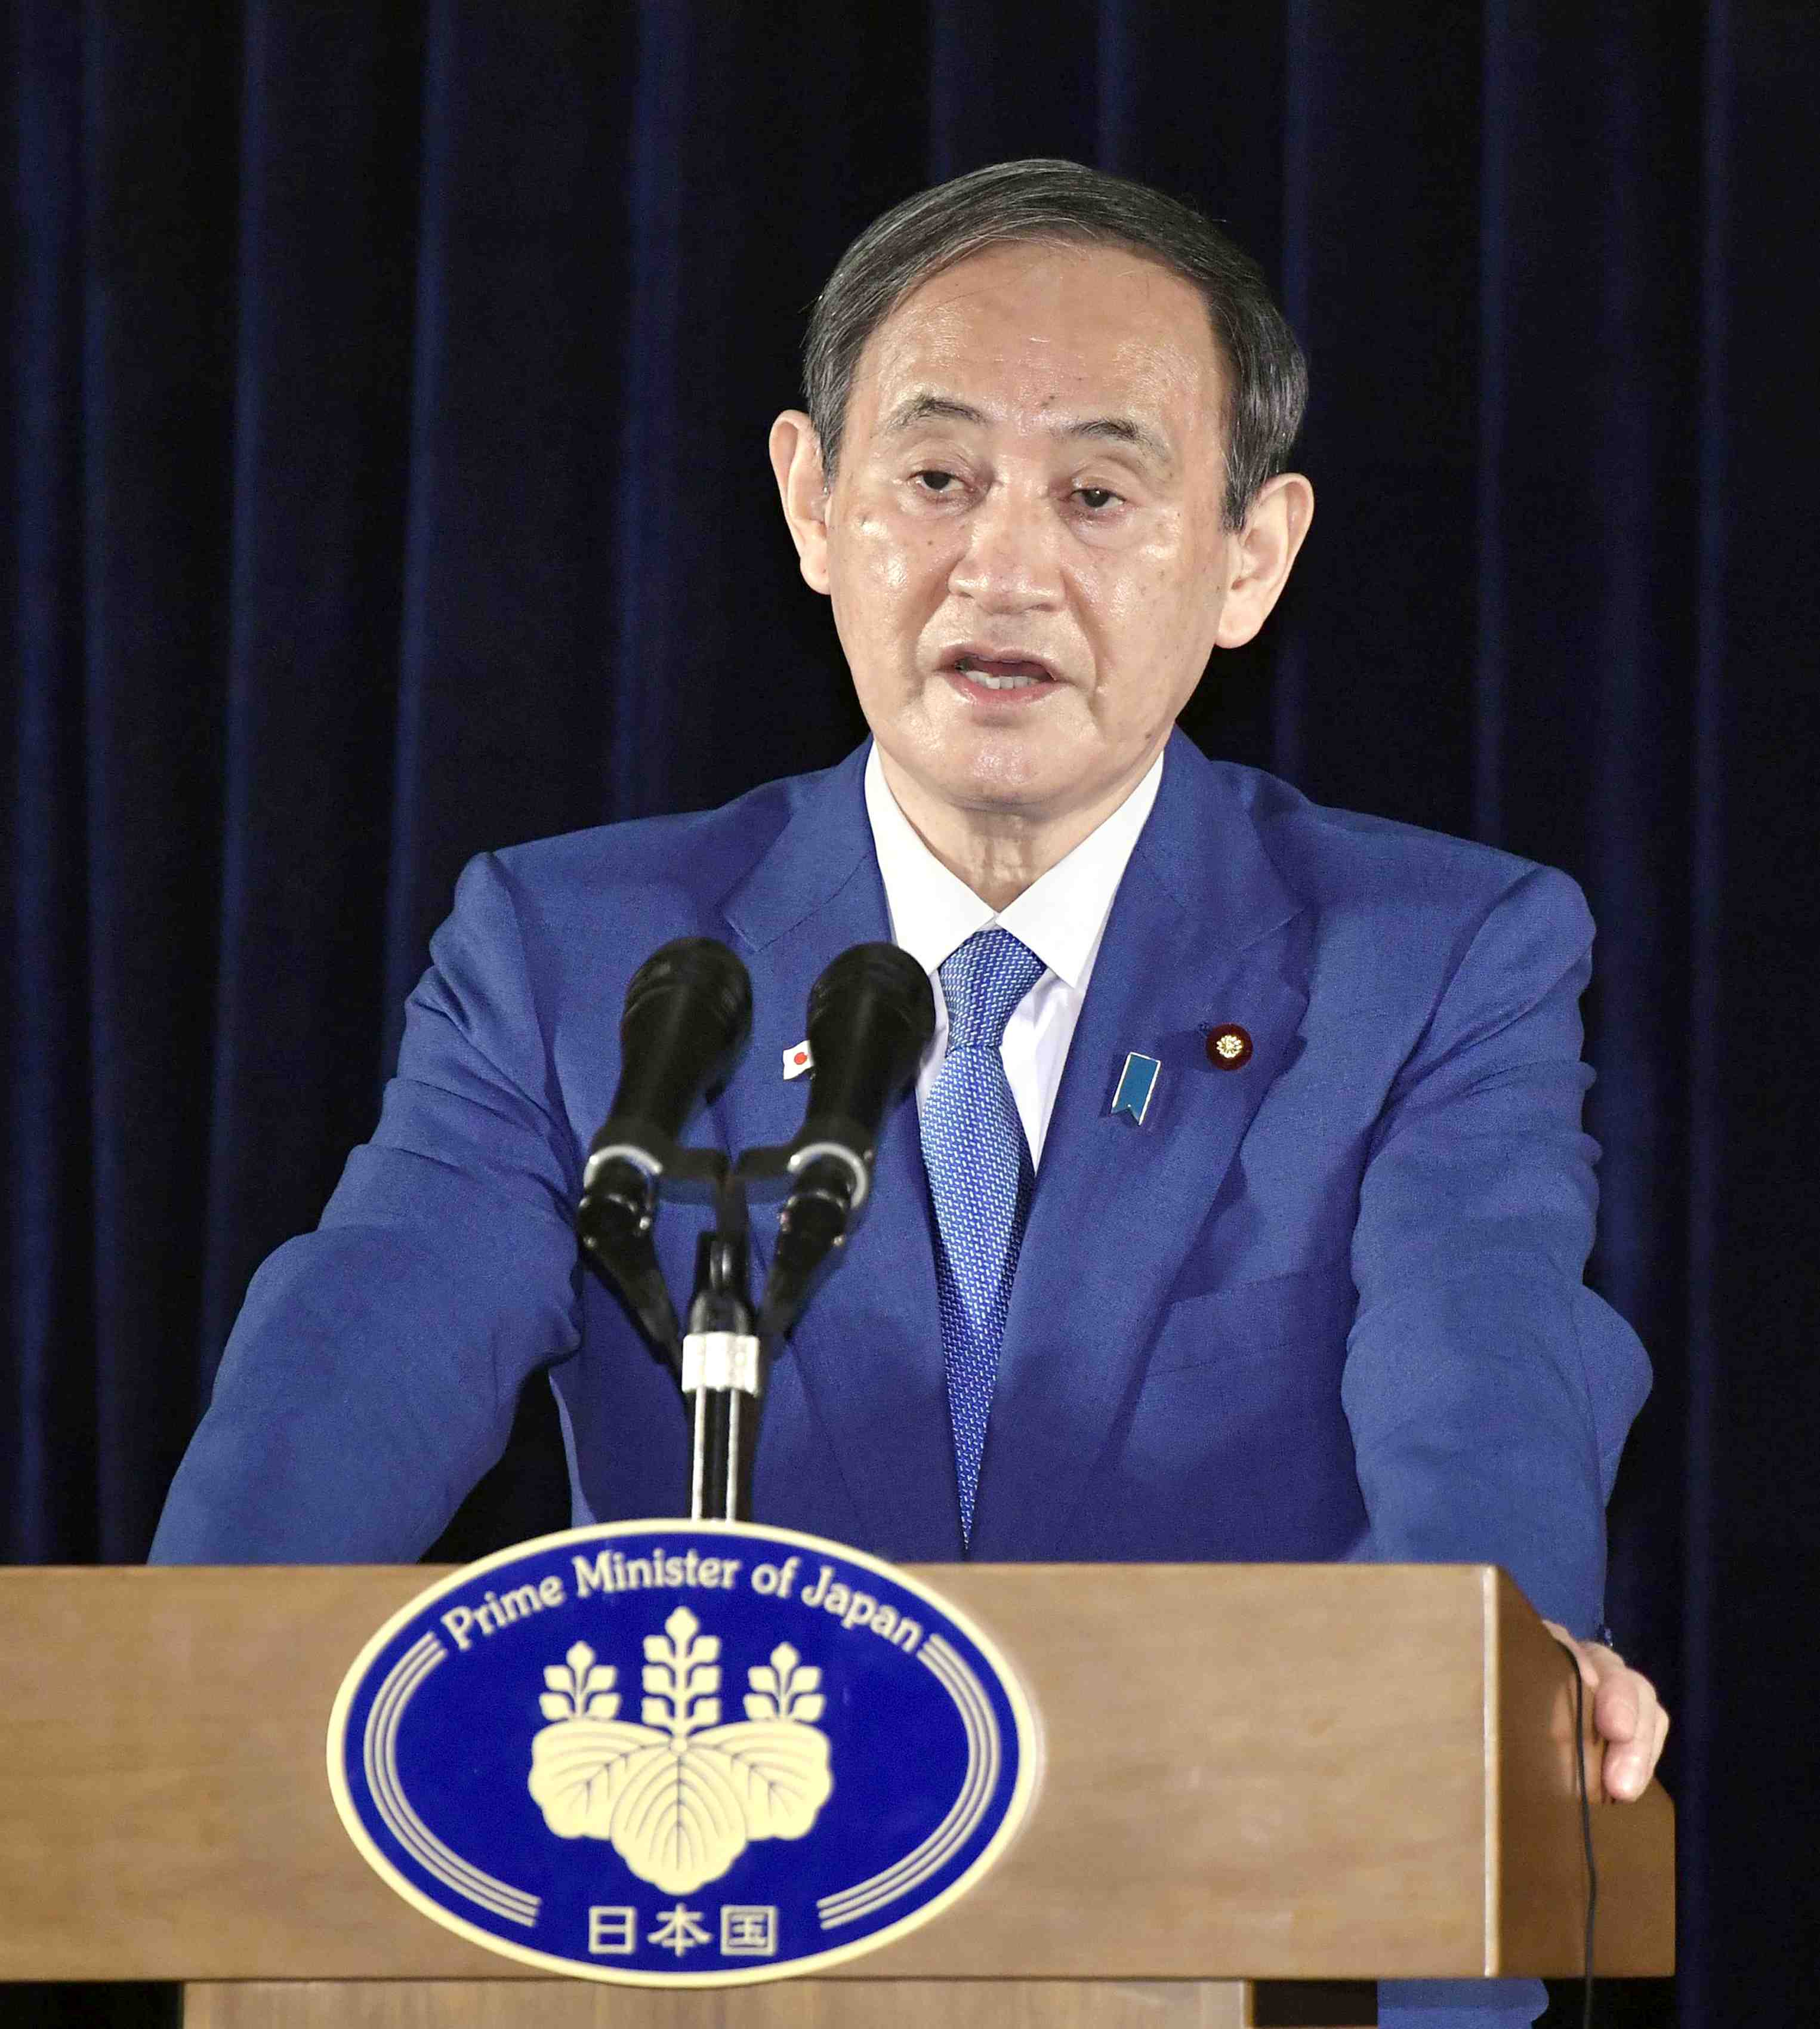 Vietnam Indonesia Japan PM Suga's visit 040